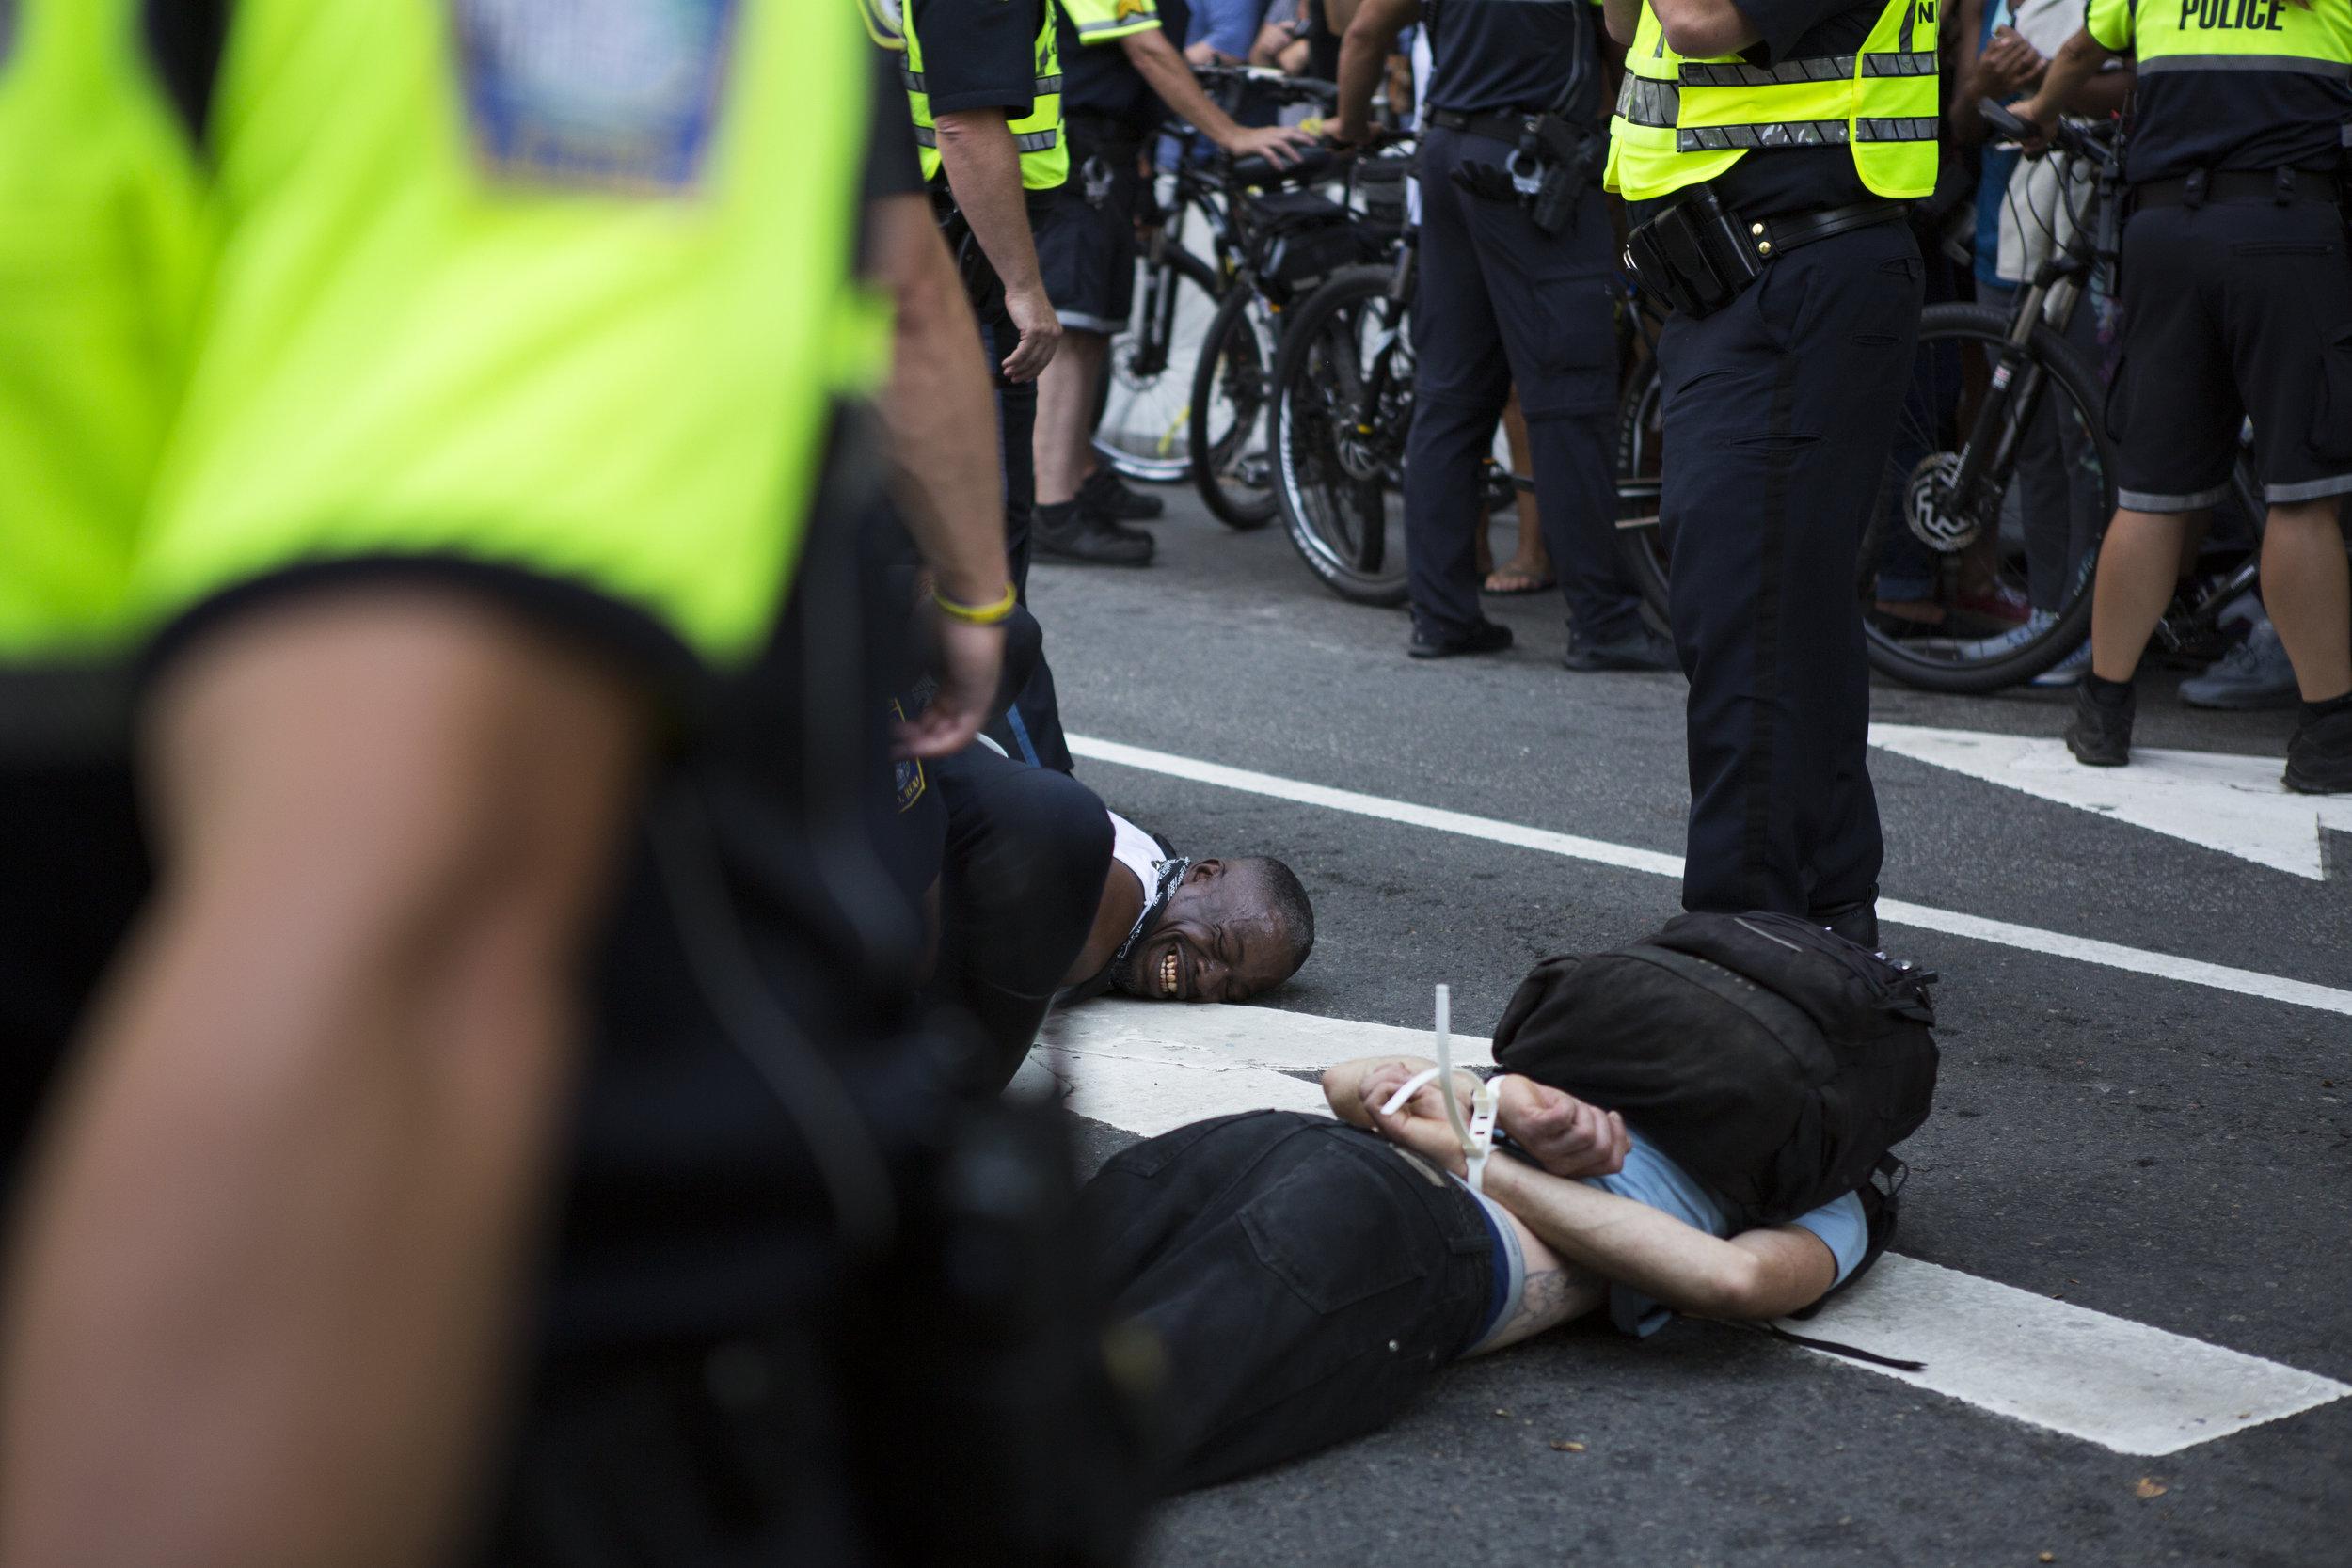 Boylston_Arrests_02.jpg